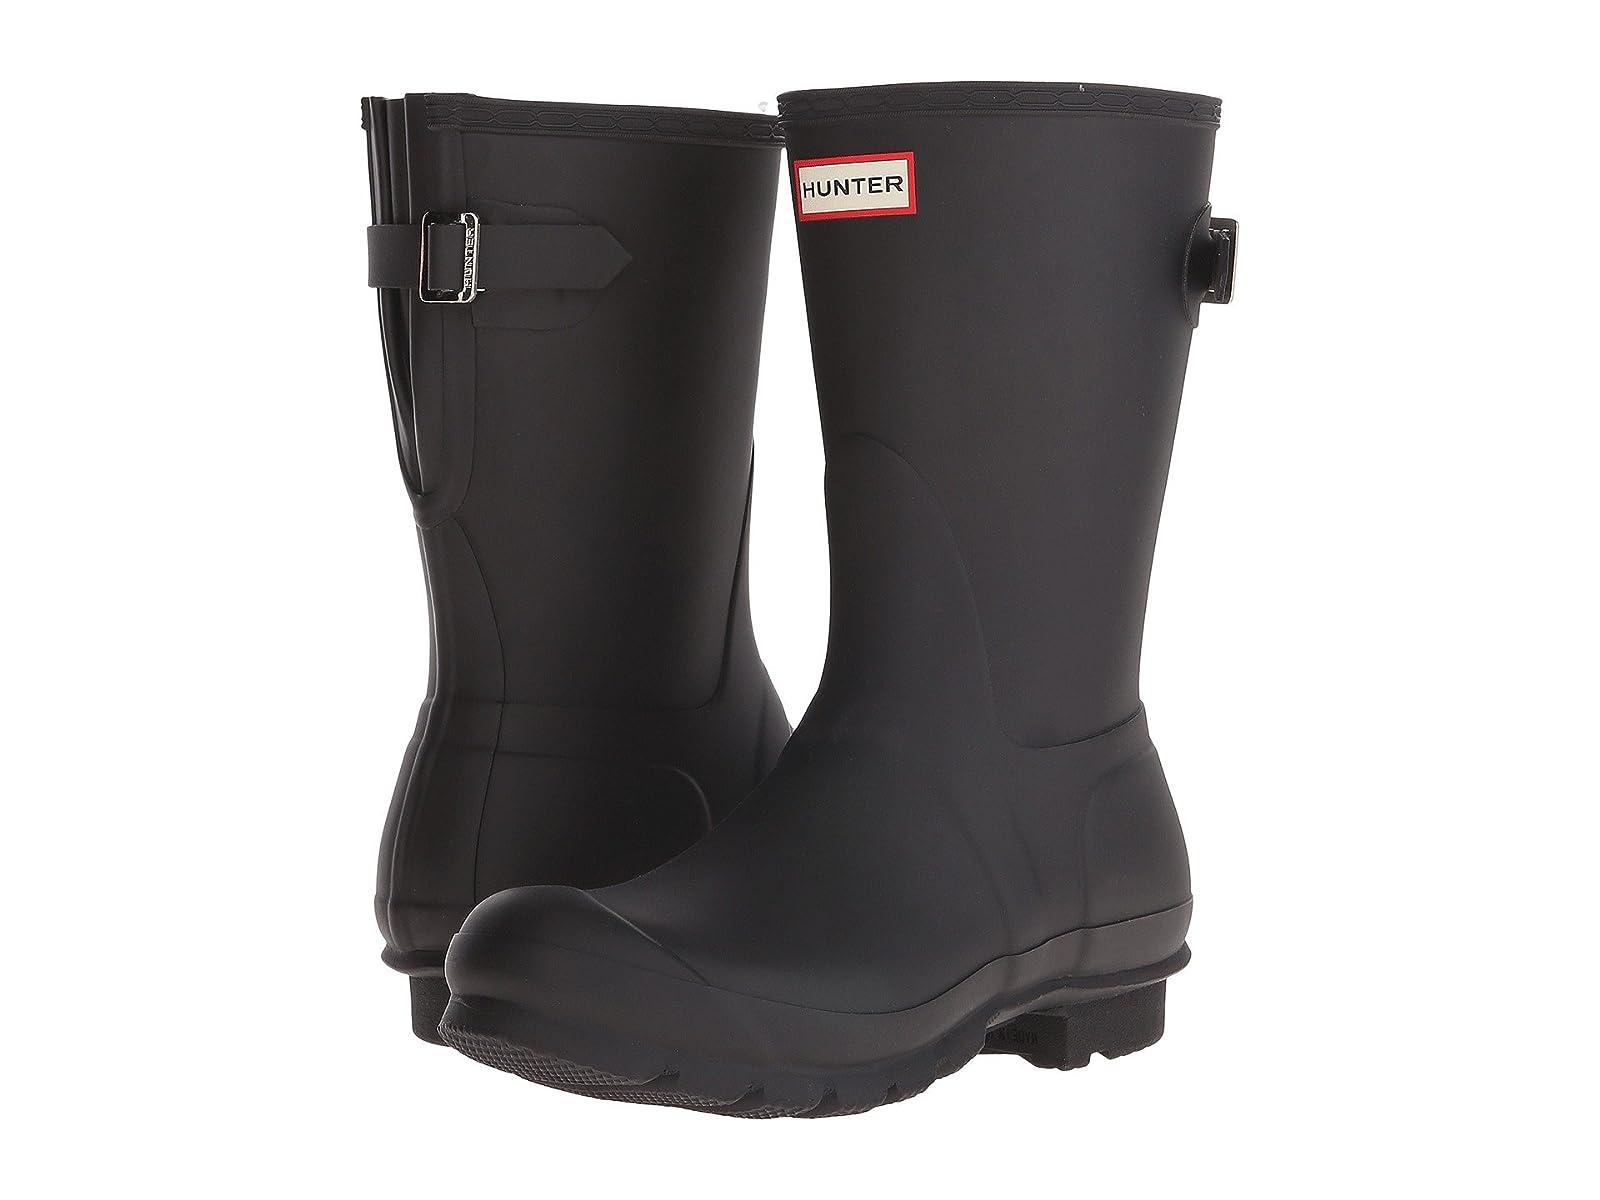 Hunter Original Short Back Adjustable Rain BootsAffordable and distinctive shoes